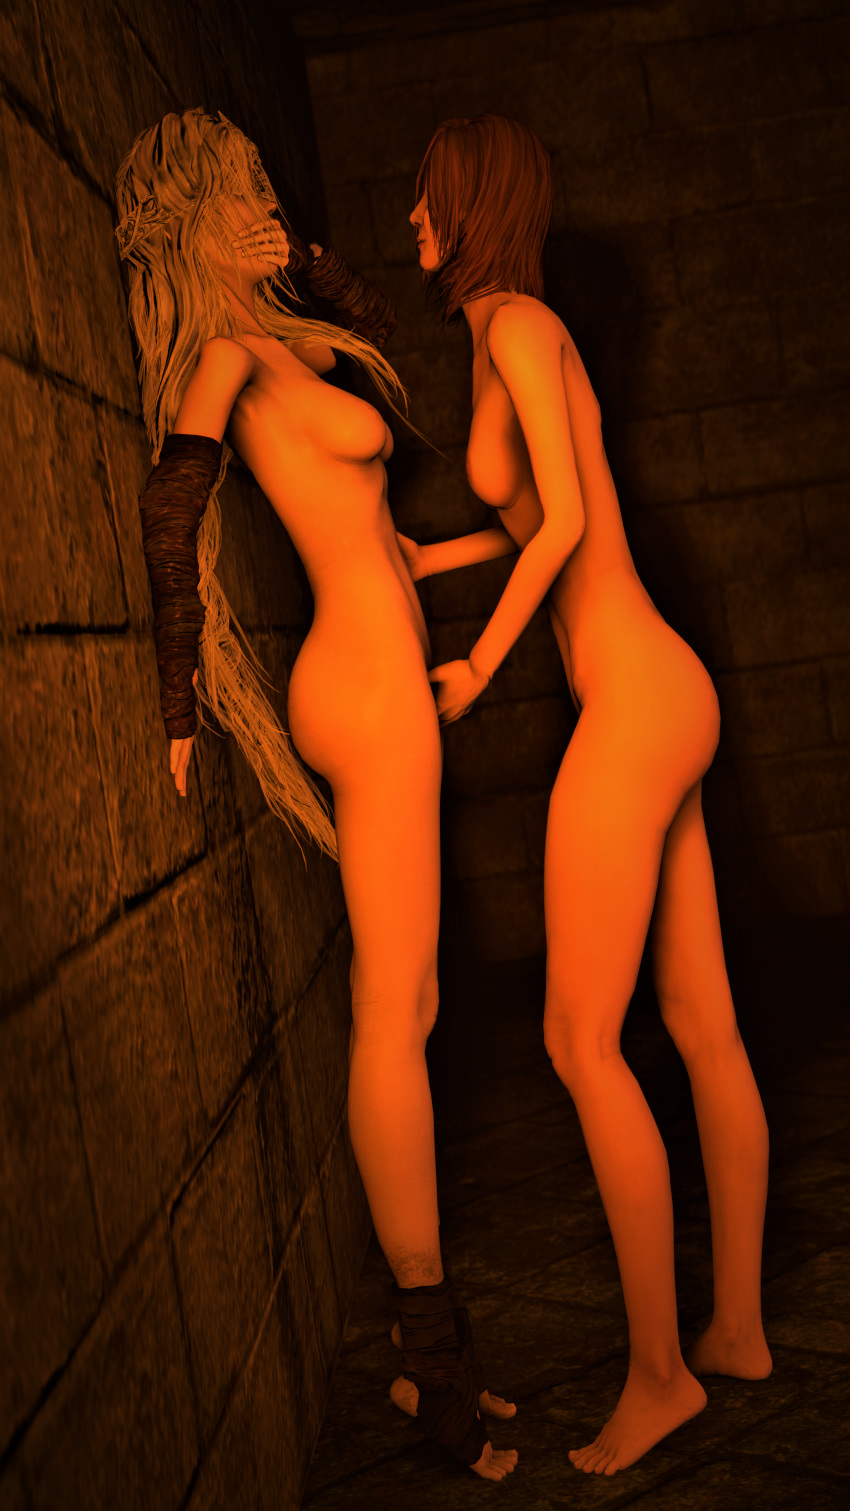 desert zoey 3 dark pyromancer souls Why is kirito a girl in sao2